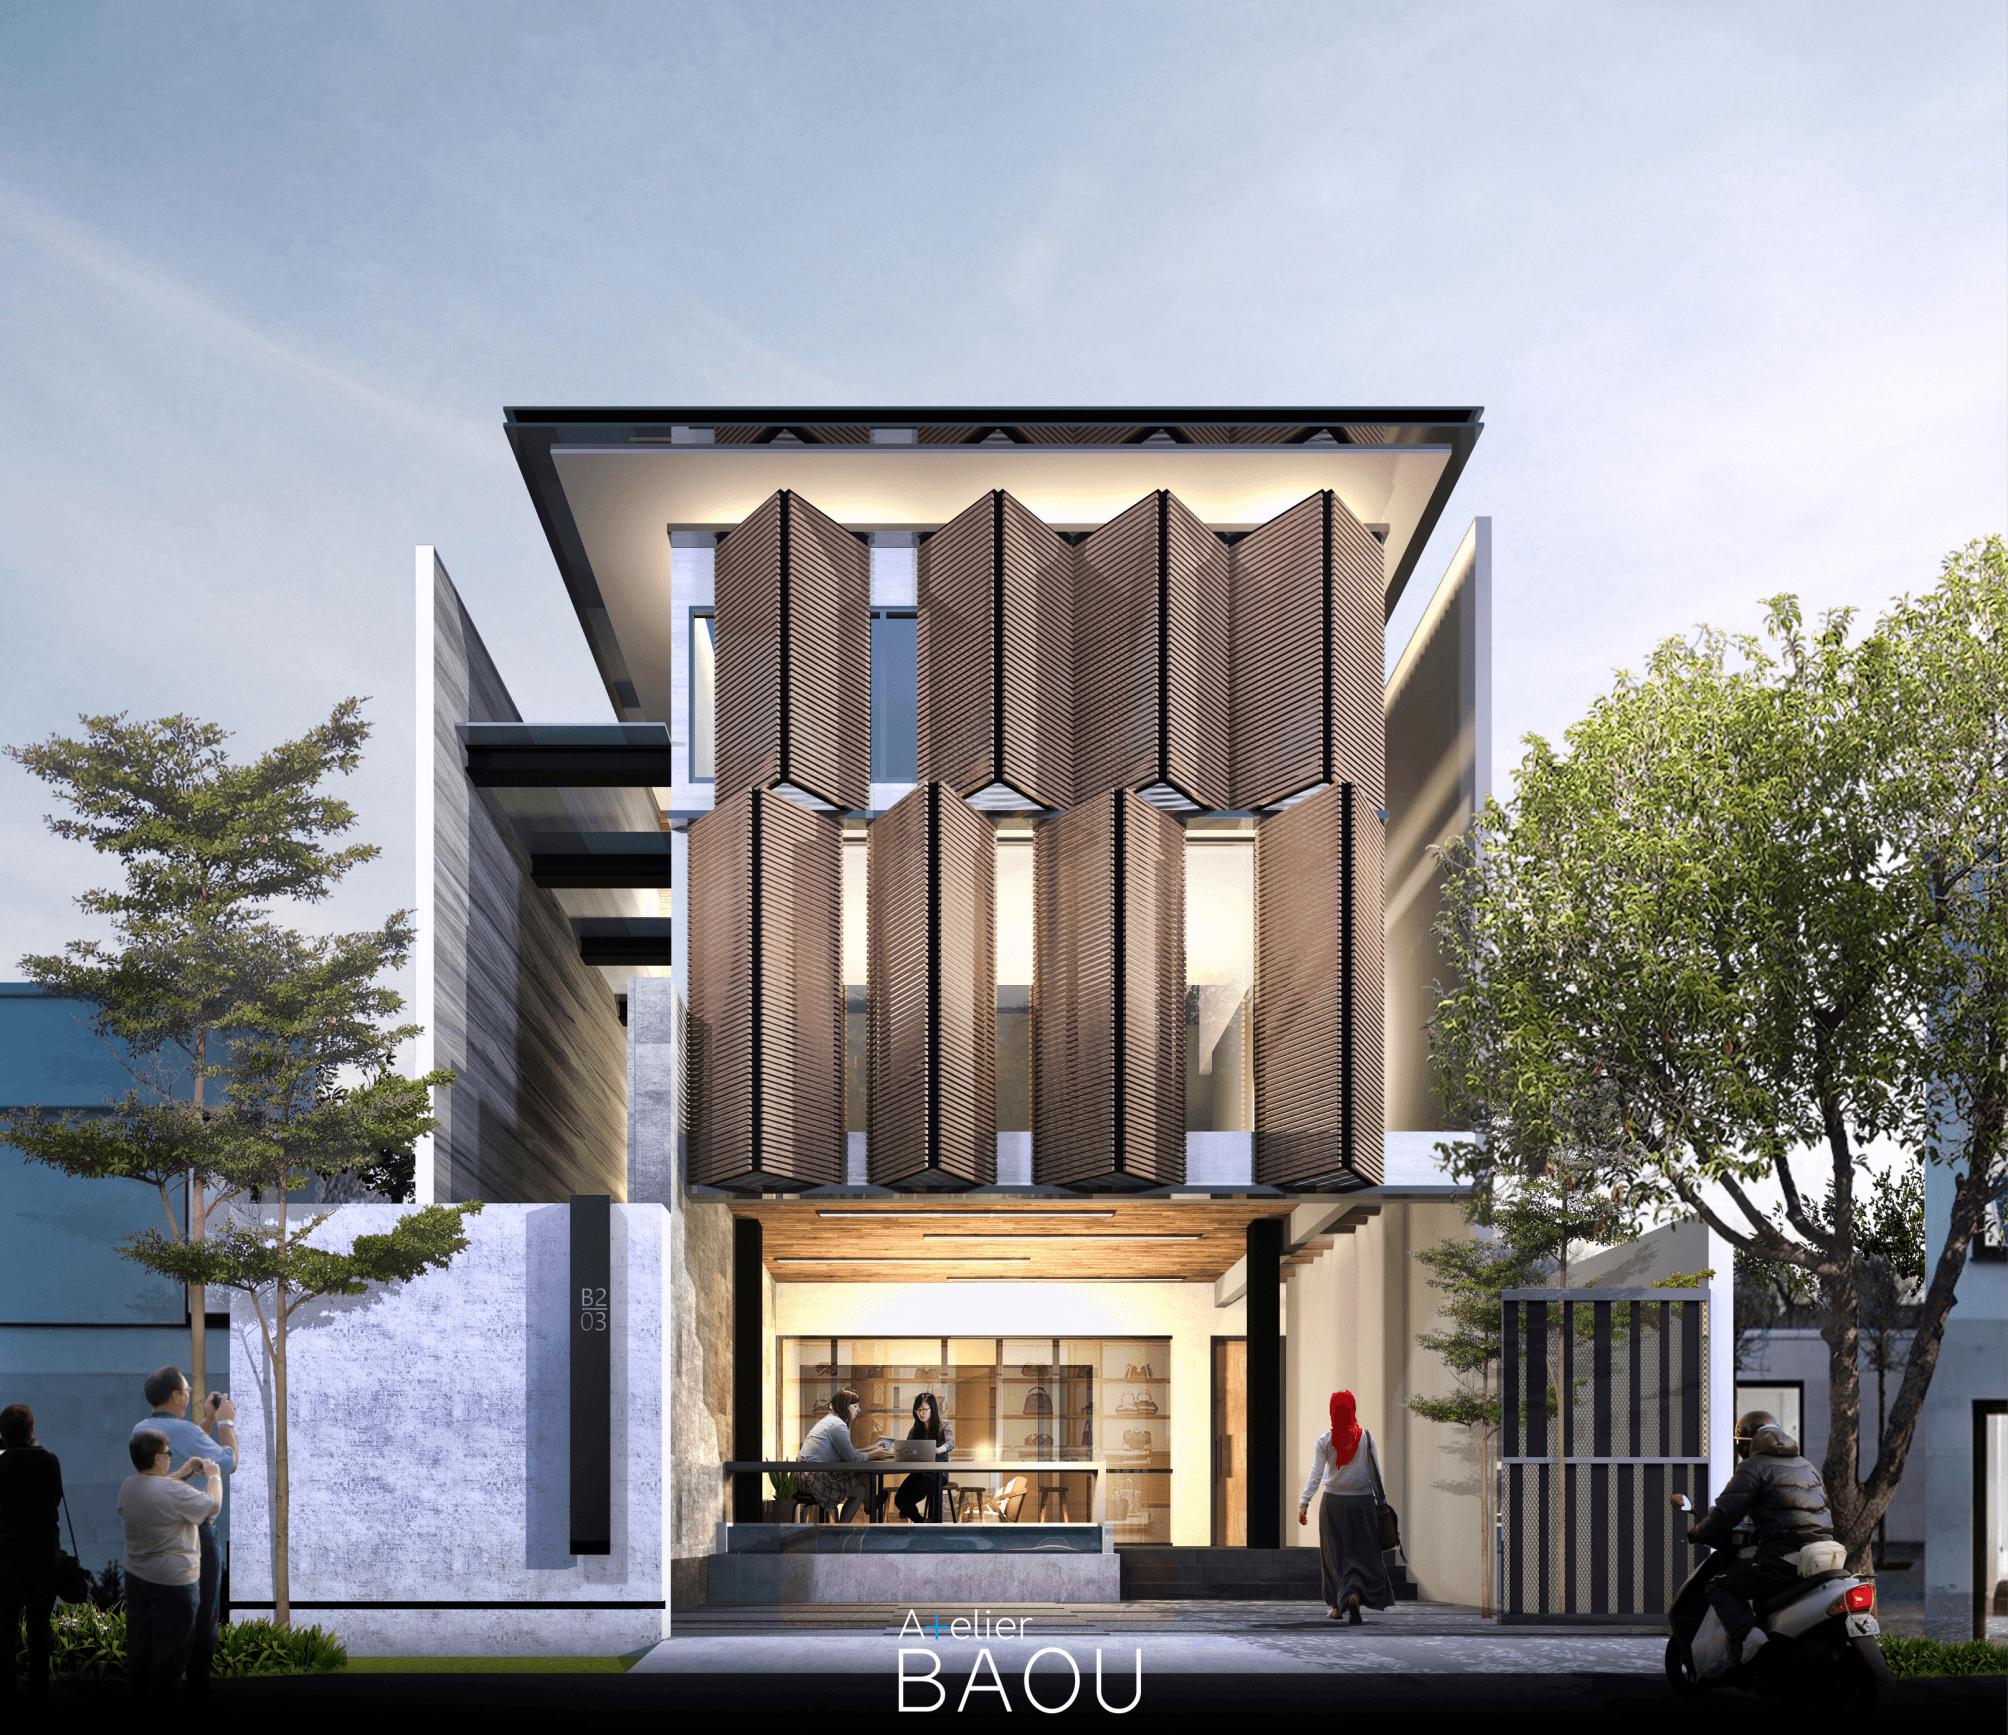 Atelier Baou Iz House Bintara, Kec. Bekasi Bar., Kota Bks, Jawa Barat, Indonesia Bintara, Kec. Bekasi Bar., Kota Bks, Jawa Barat, Indonesia Atelier-Baou-Iz-House  86458